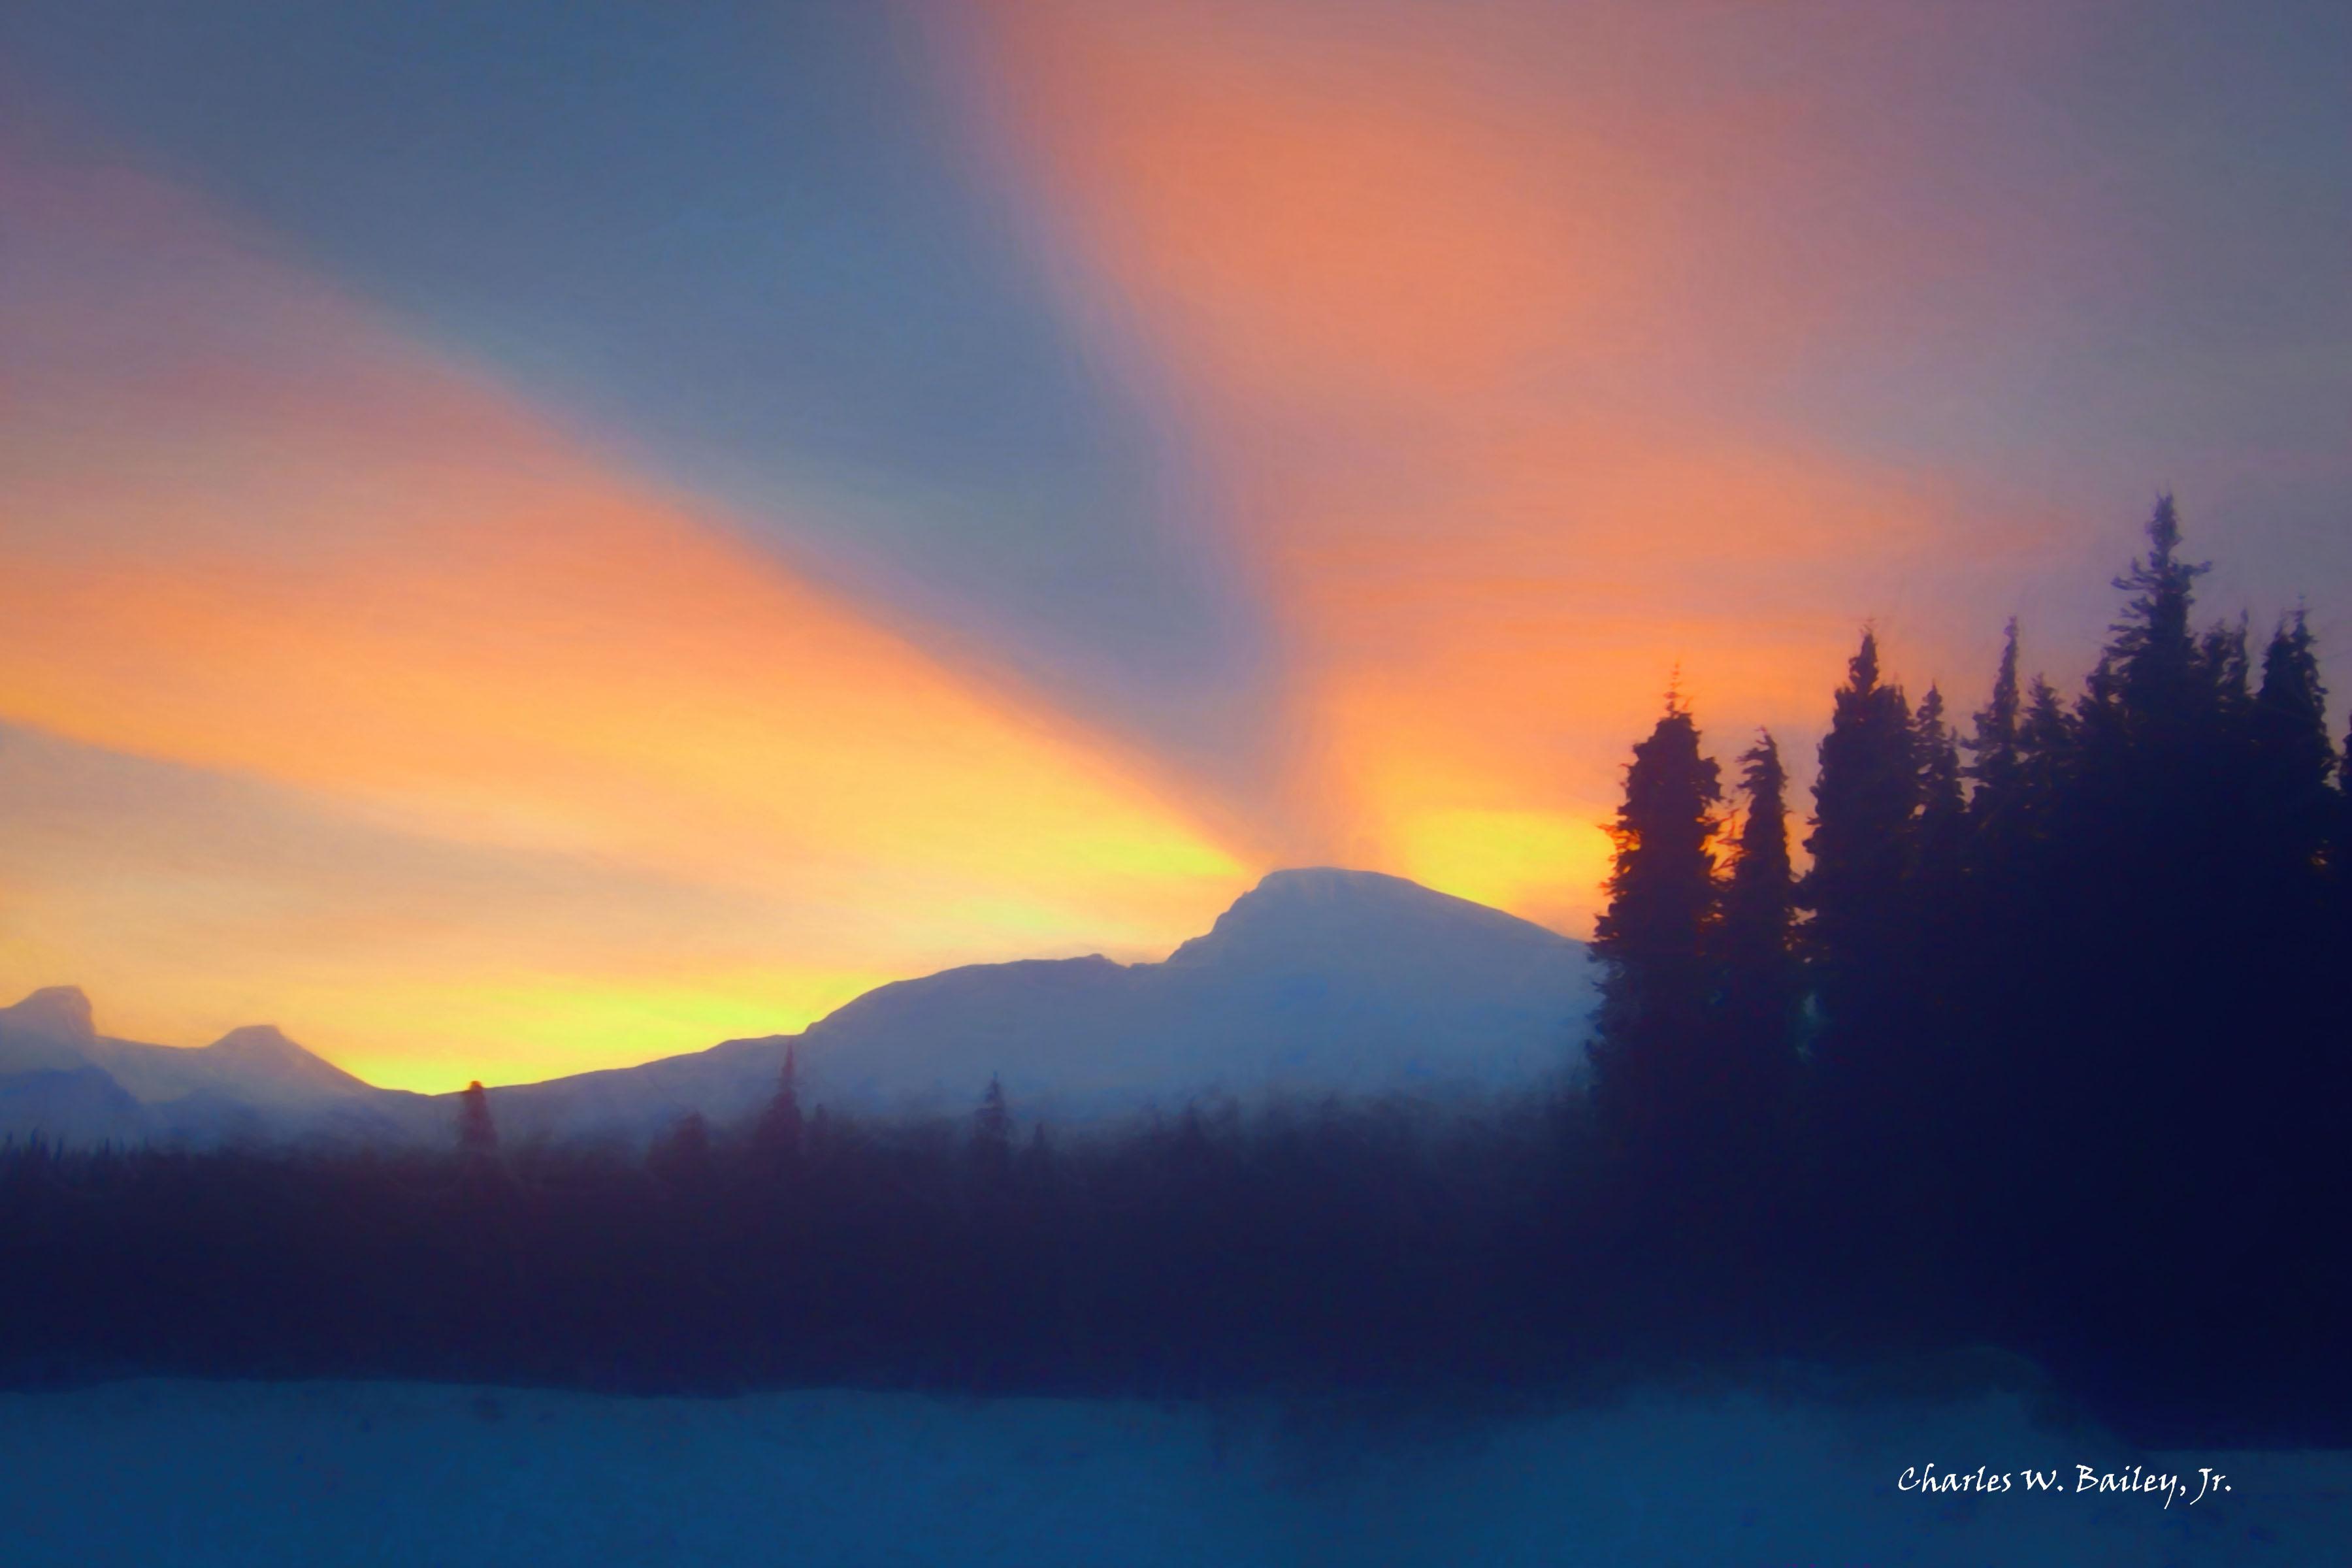 3600x2400 Wallpaper Sunlight, Drawing, Sunset, Sunrise, Evening, Horizon